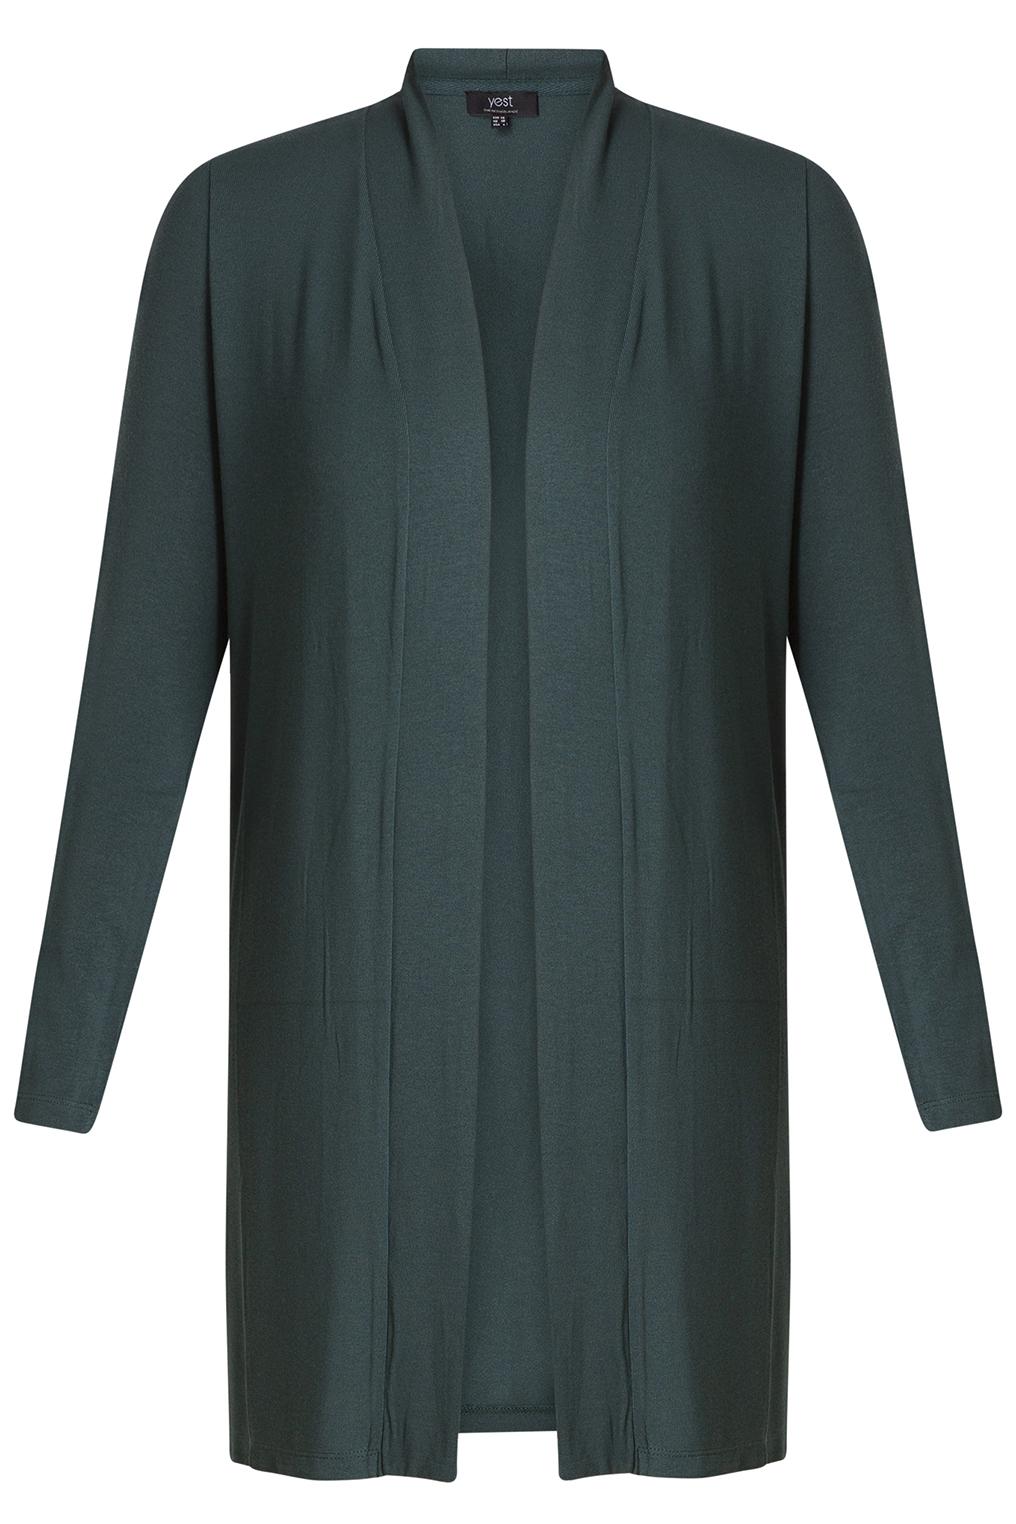 Vest Ayla Essential Yesta